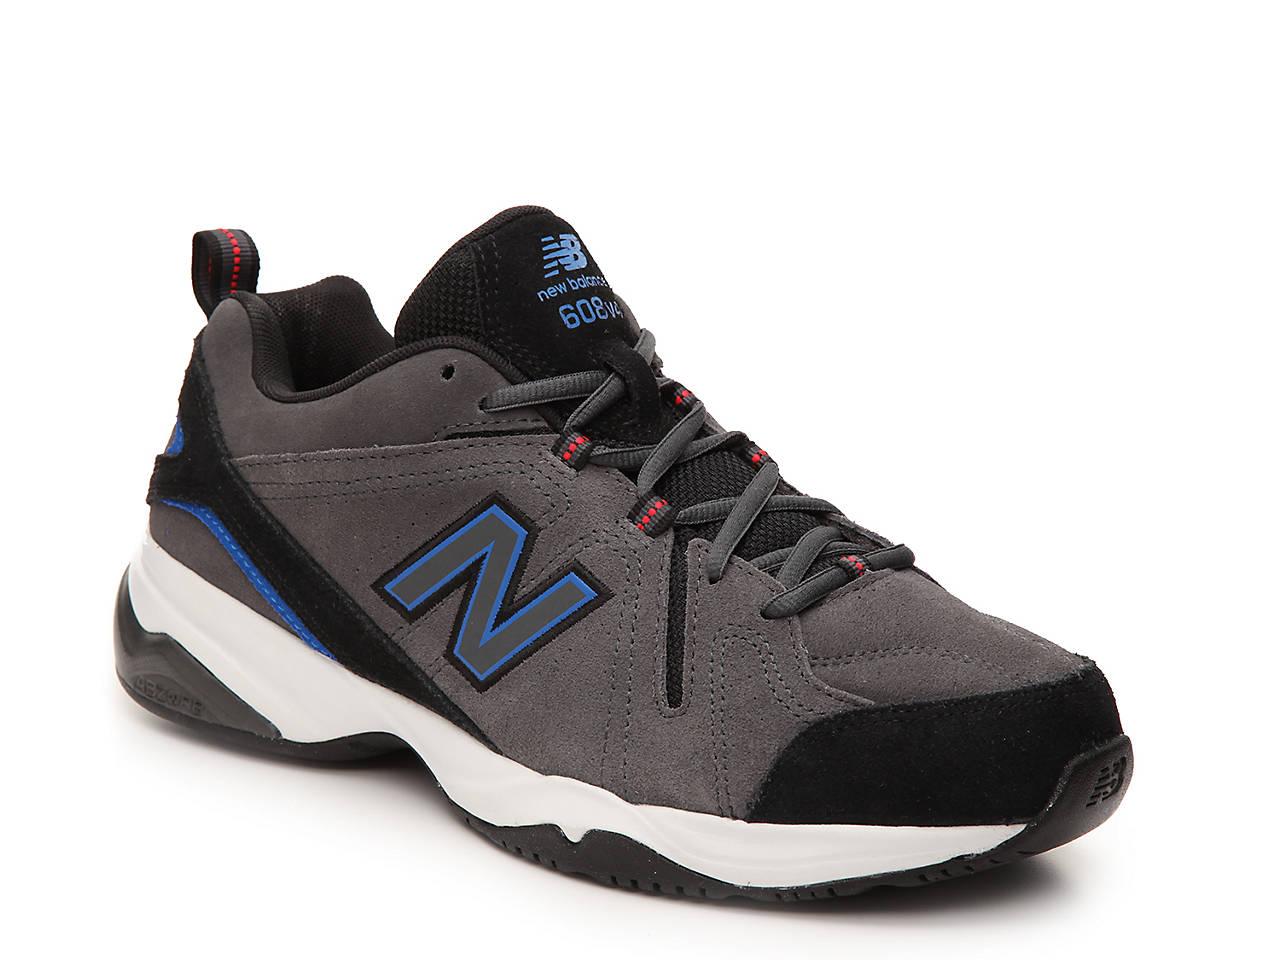 8758881da2a0 New Balance 608 V4 Training Shoe - Men s Men s Shoes